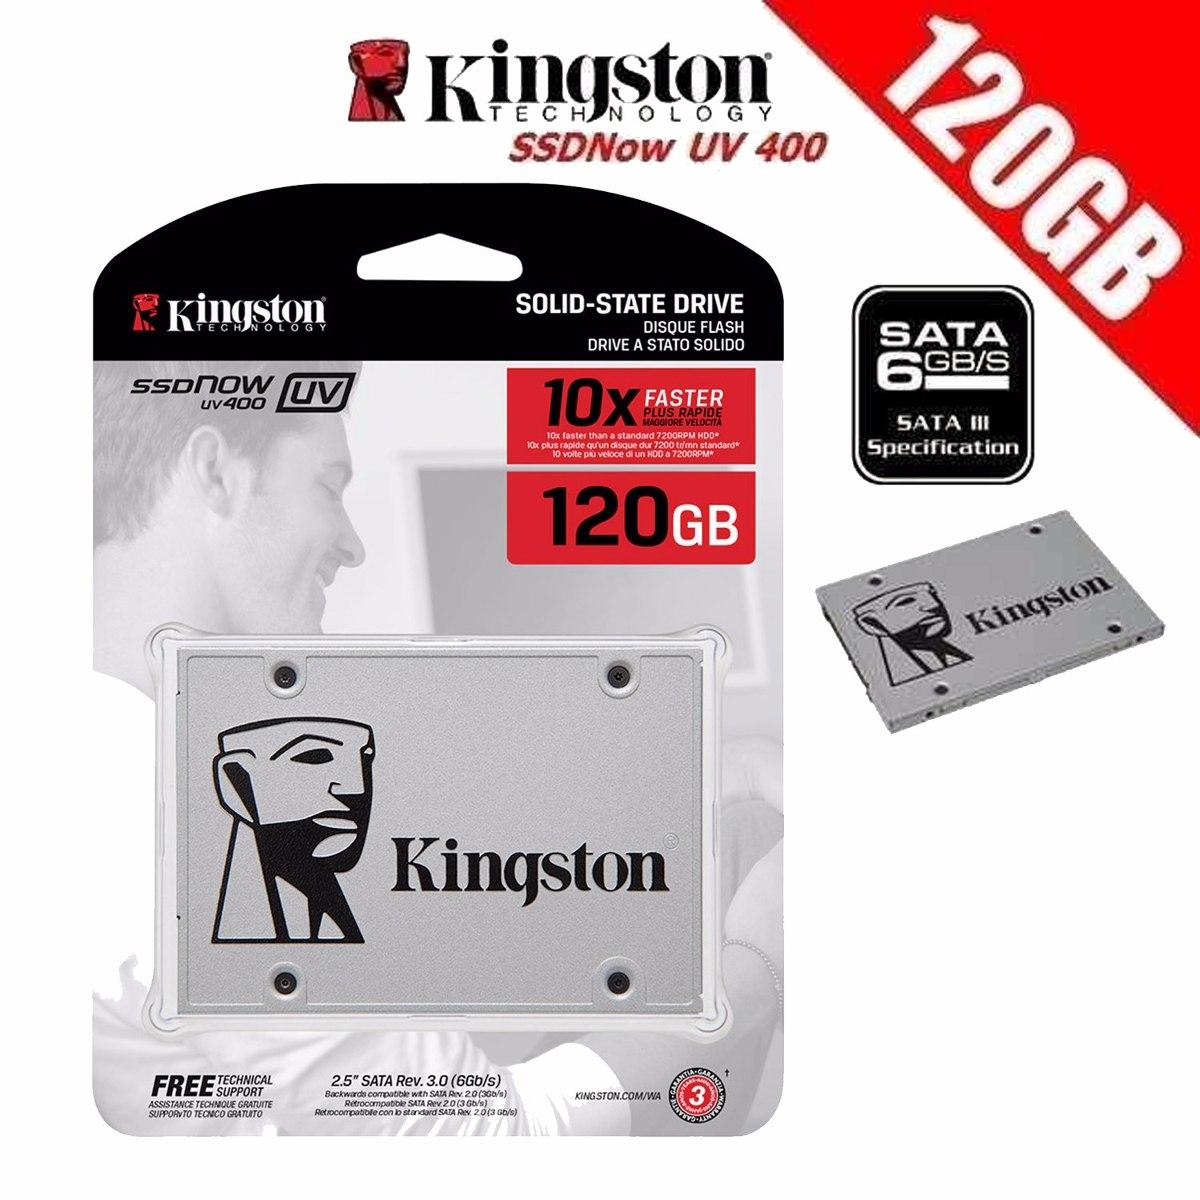 Hd Ssd 120gb Sata 3 Kingston 120 Gb Uv400 Poucas Peças Corra - R$ 194,99 em Mercado Livre